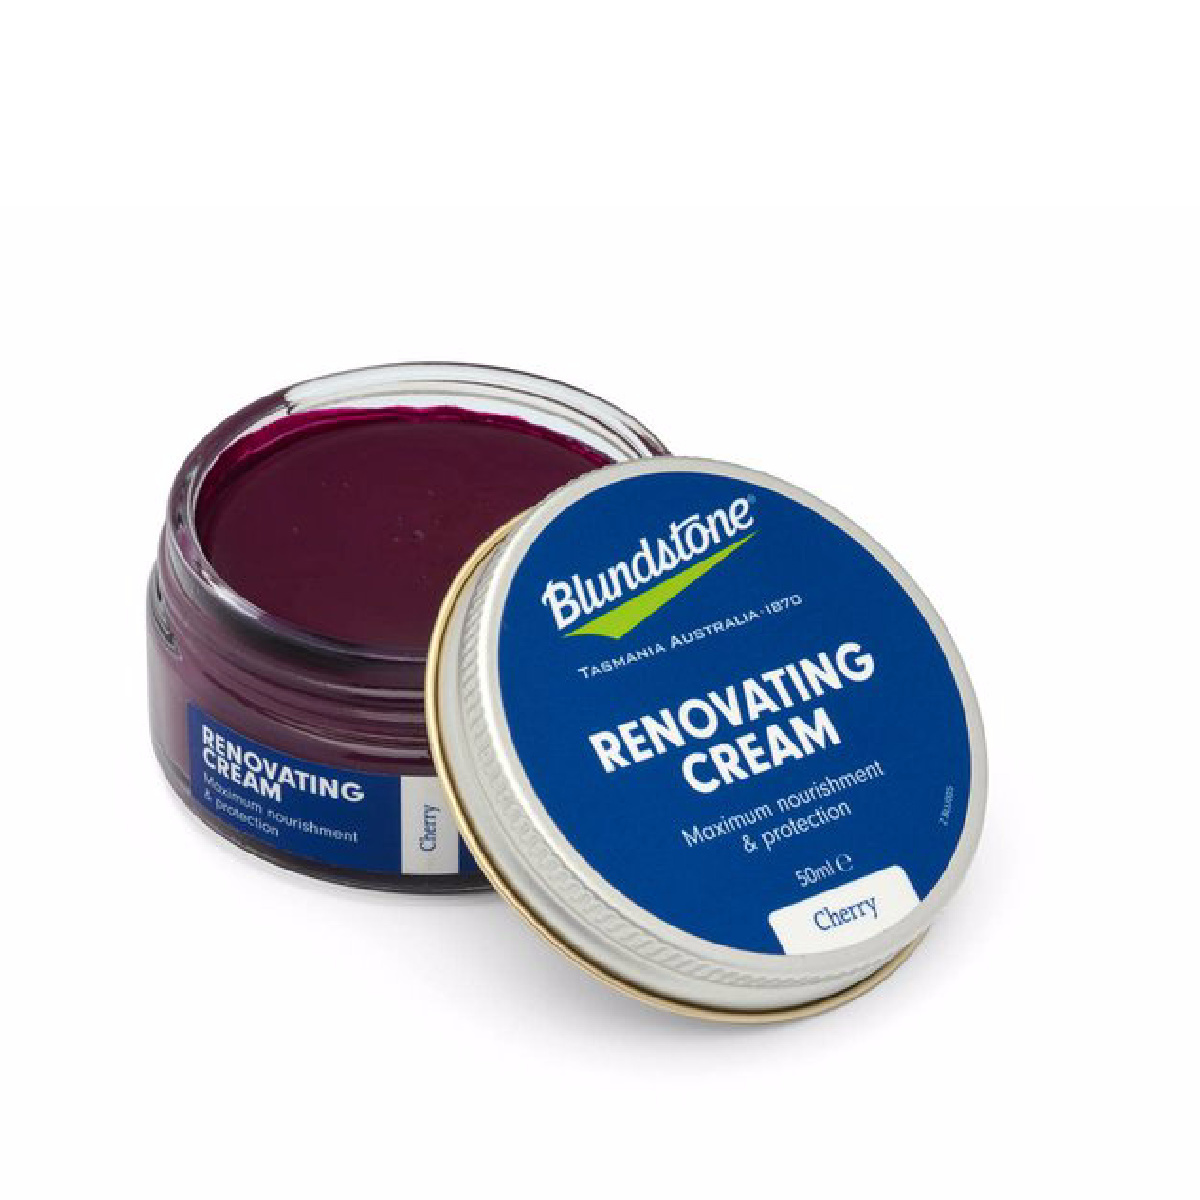 Blundstone Blundstone Renovation Cream Cherry